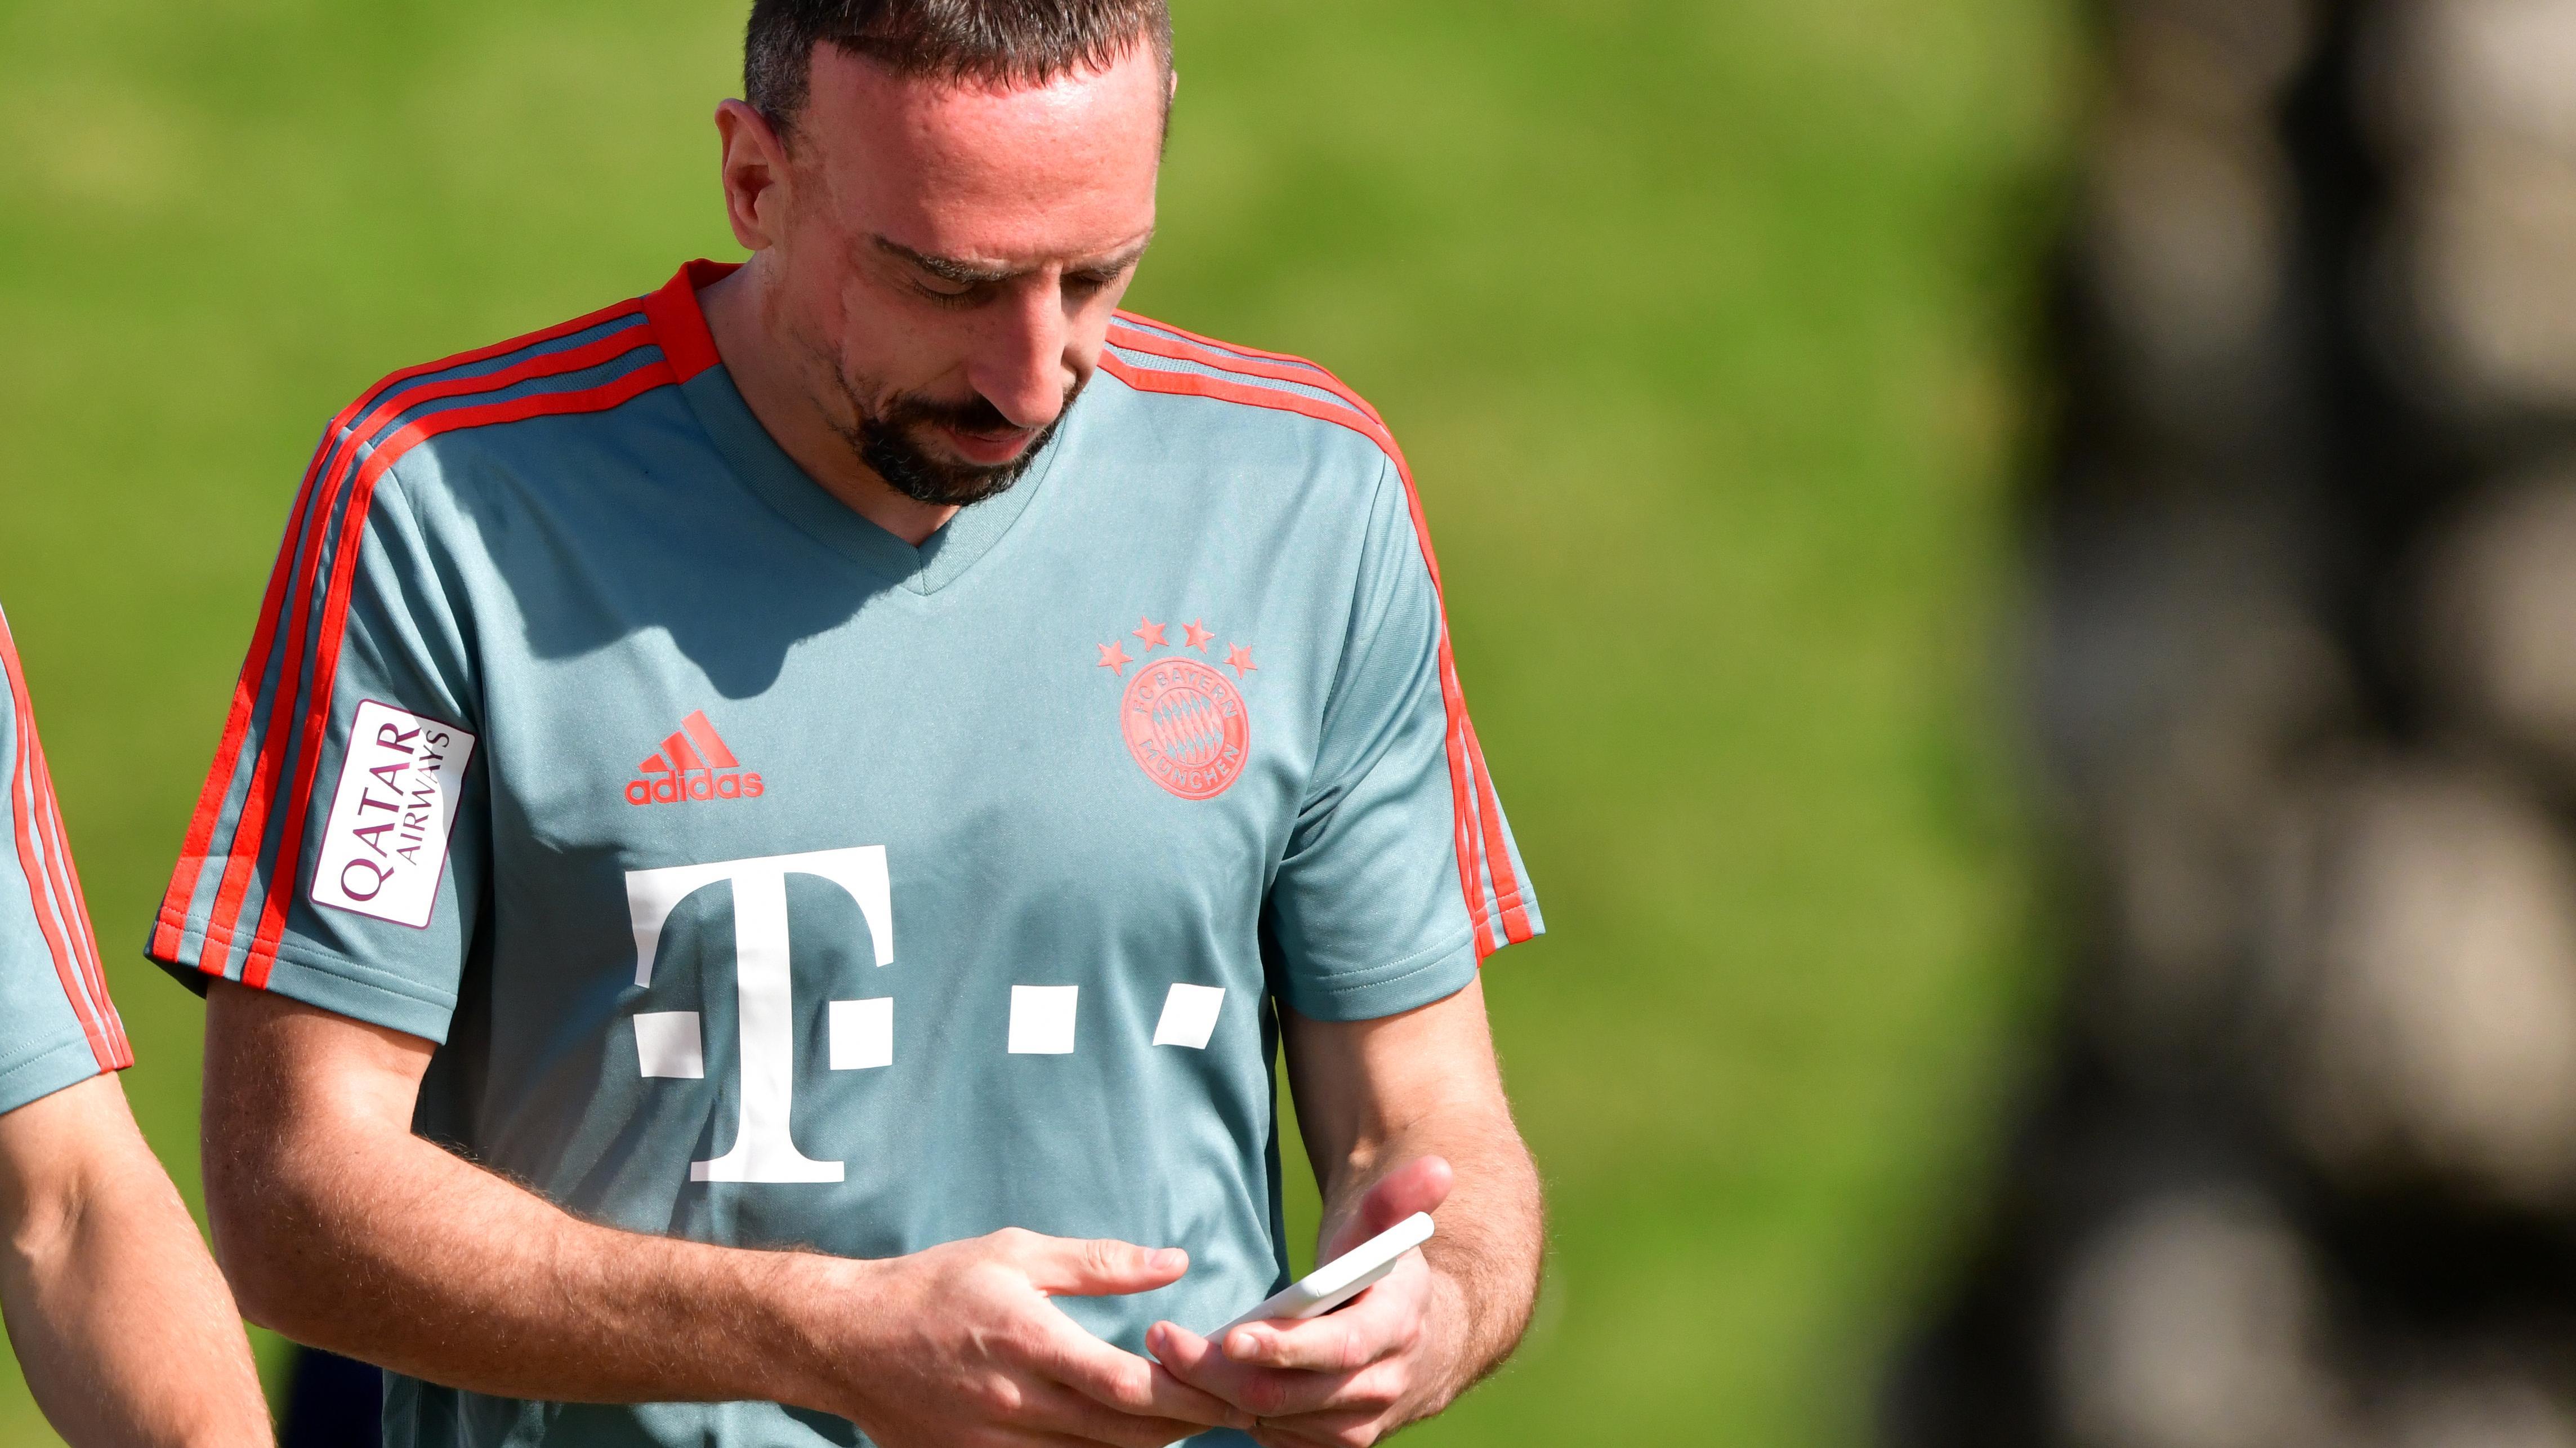 Franck Ribéry spielt mit seinem Handy im Traingslager